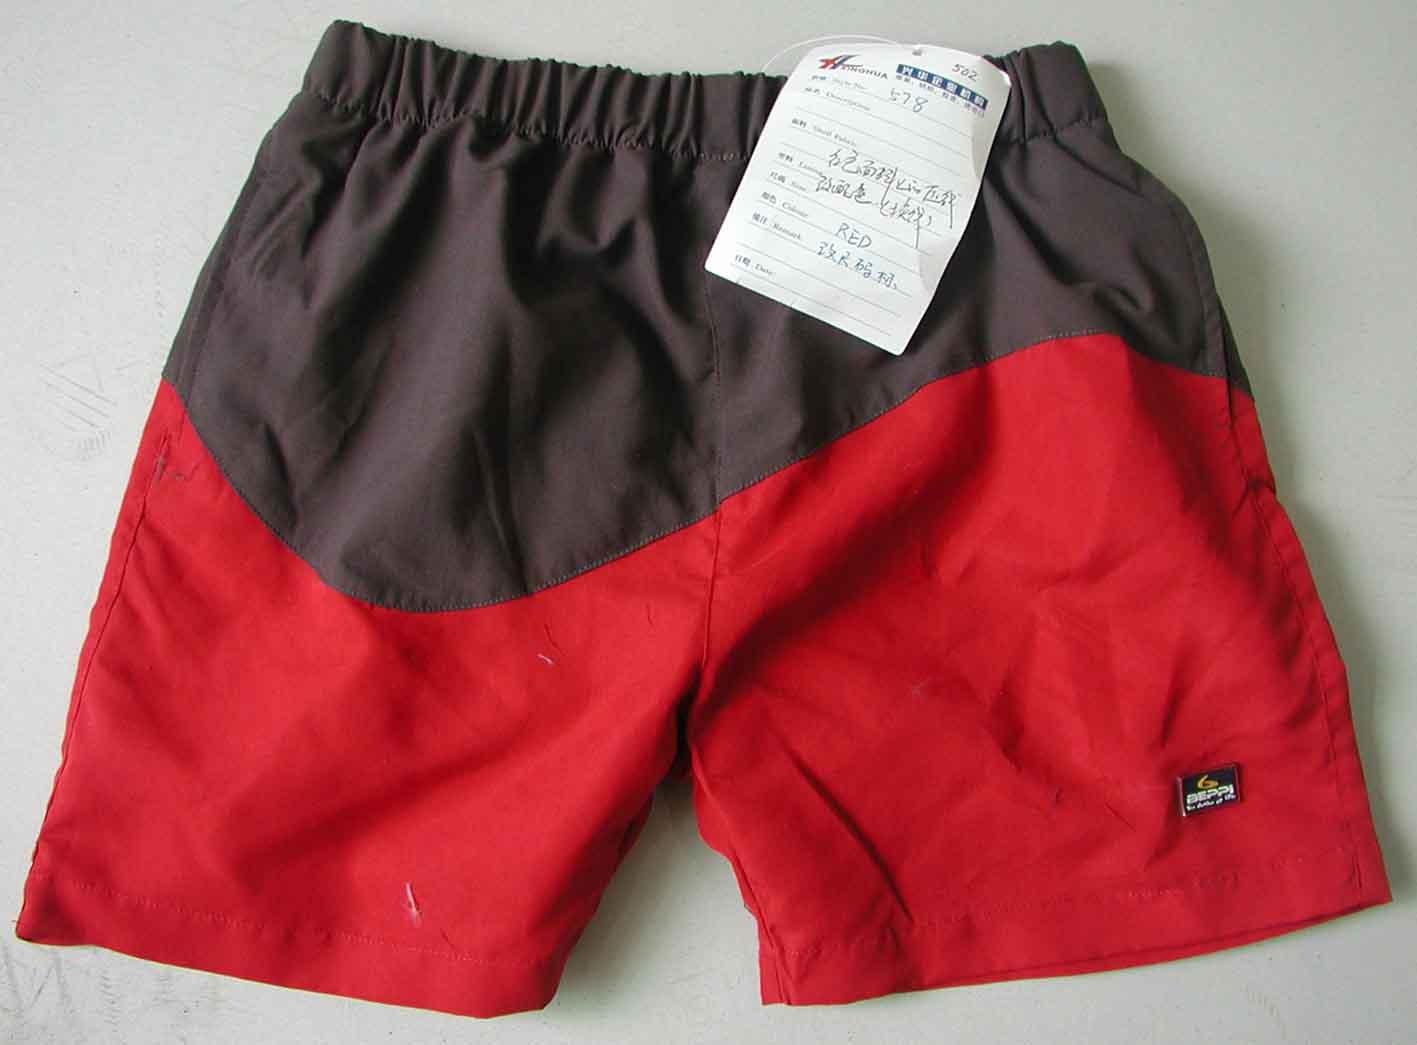 Short Pant, Shorts